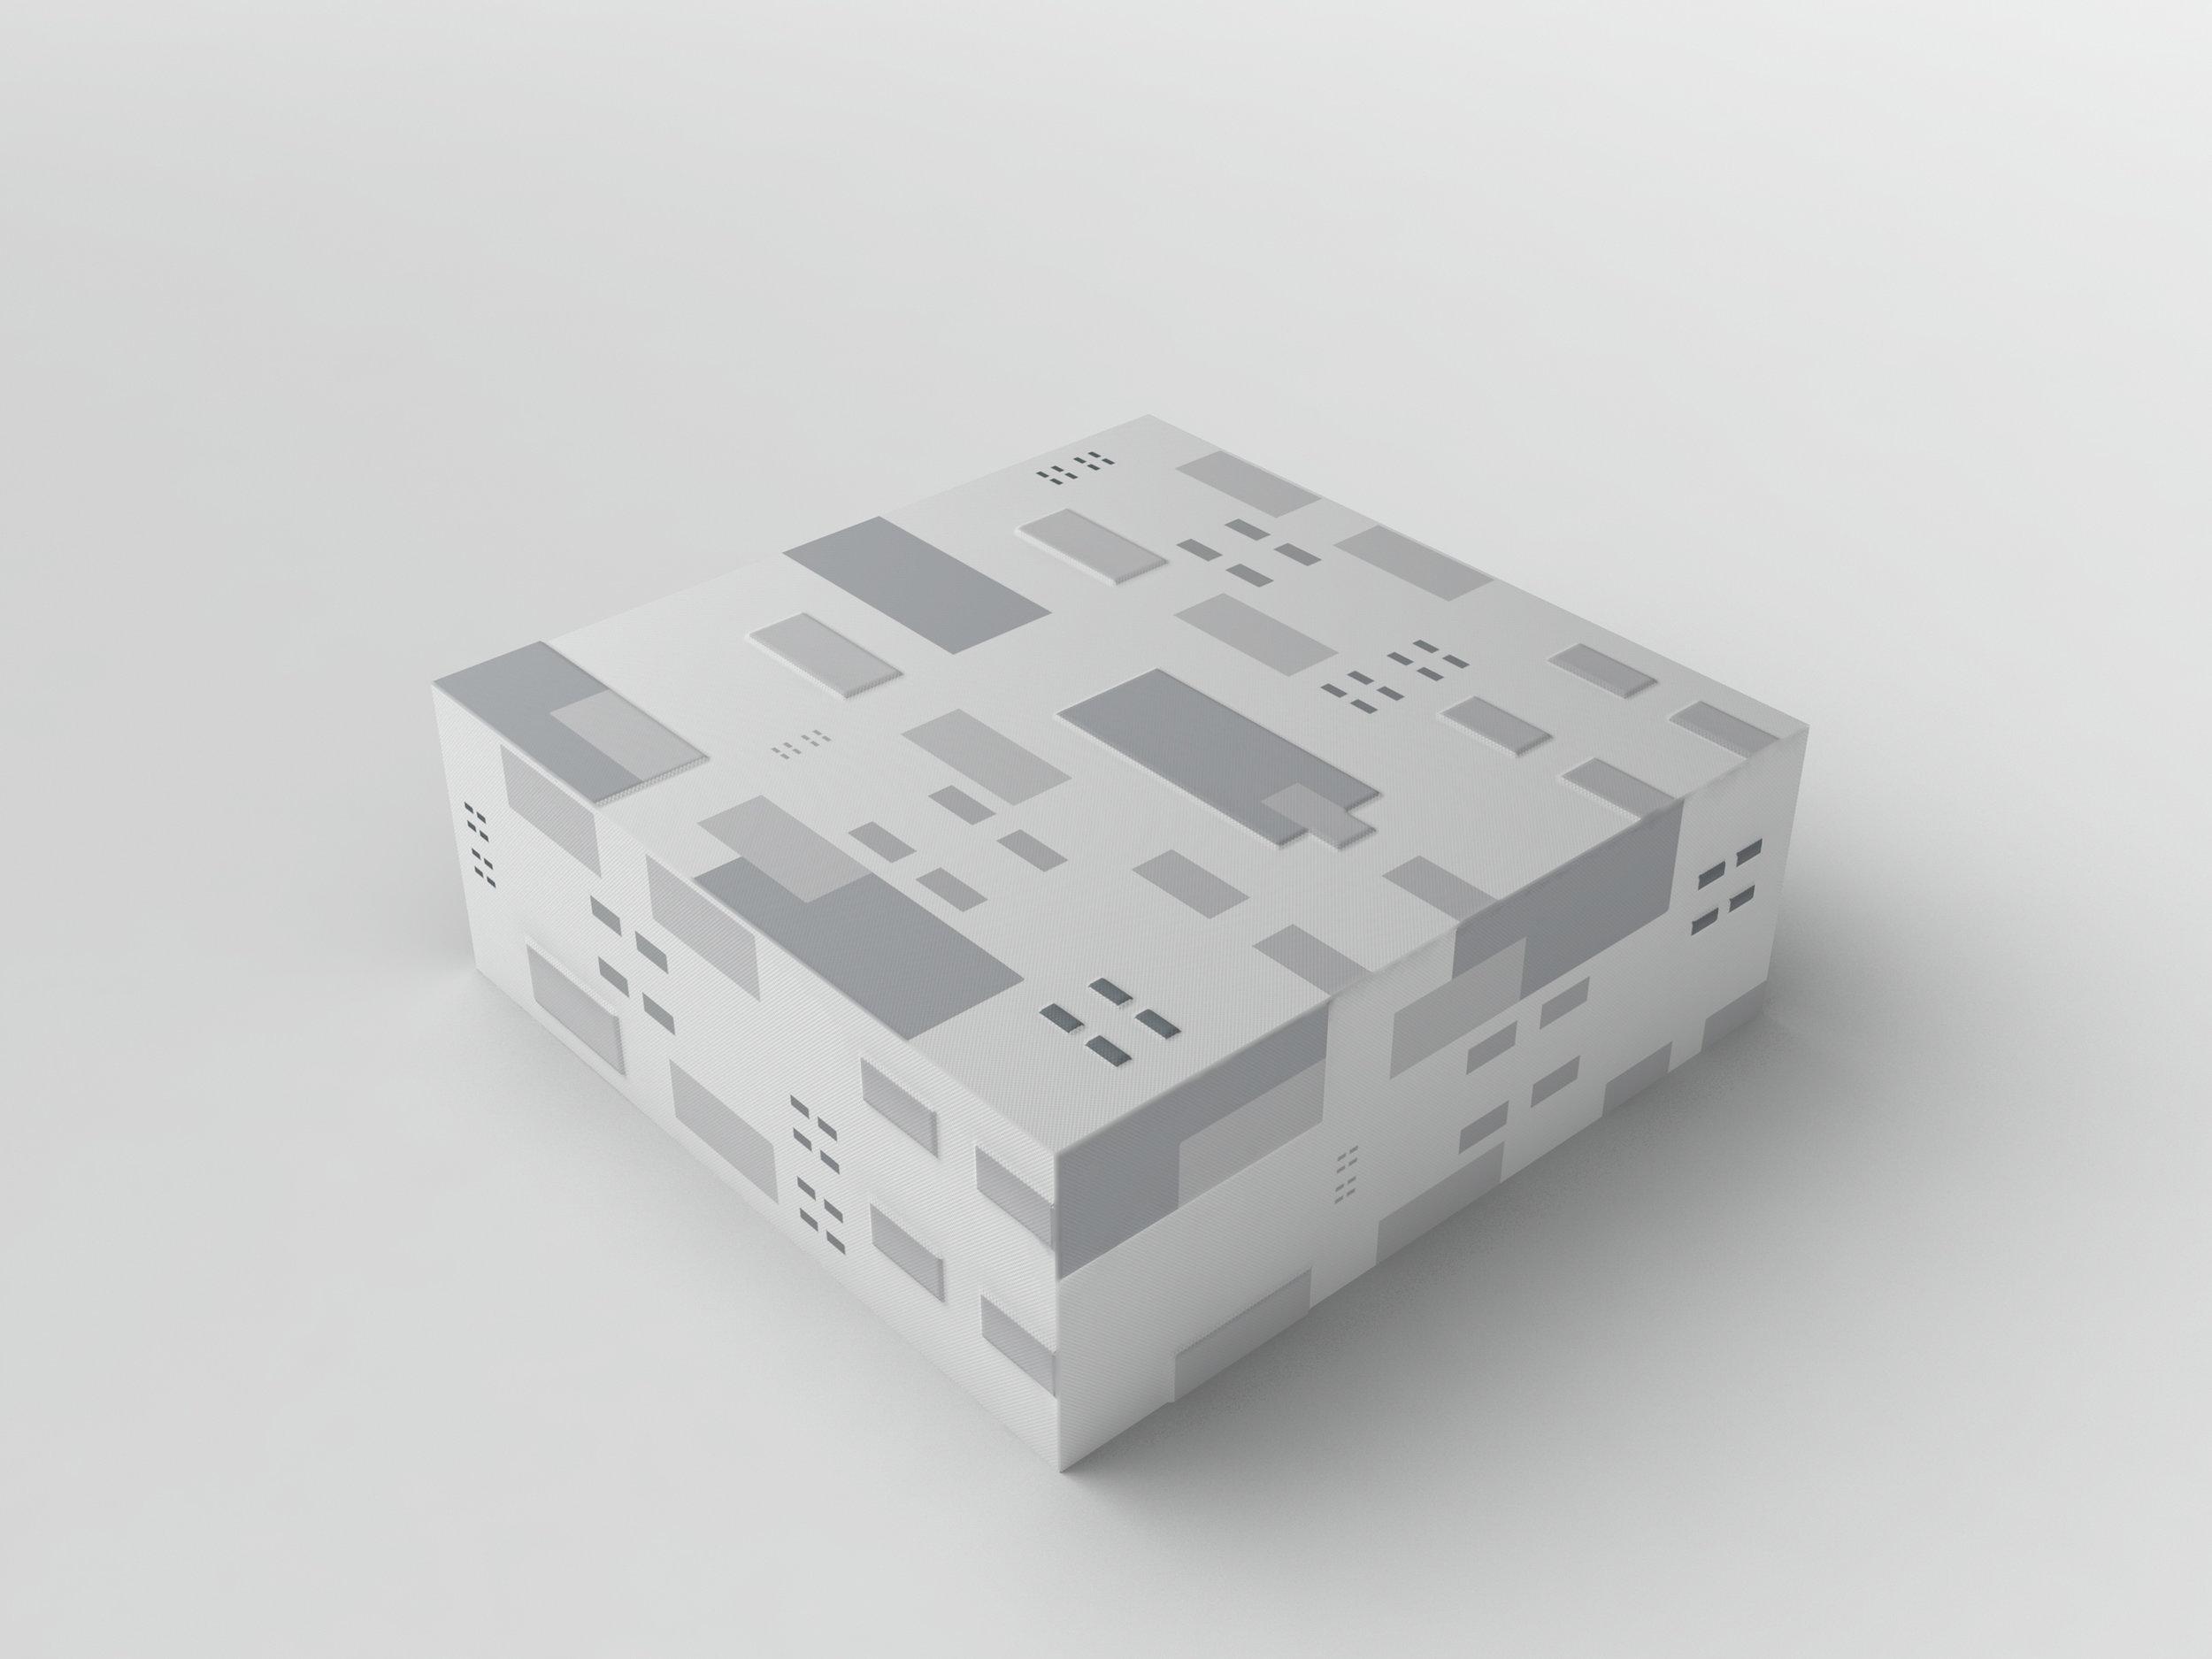 box4-11x17.jpg